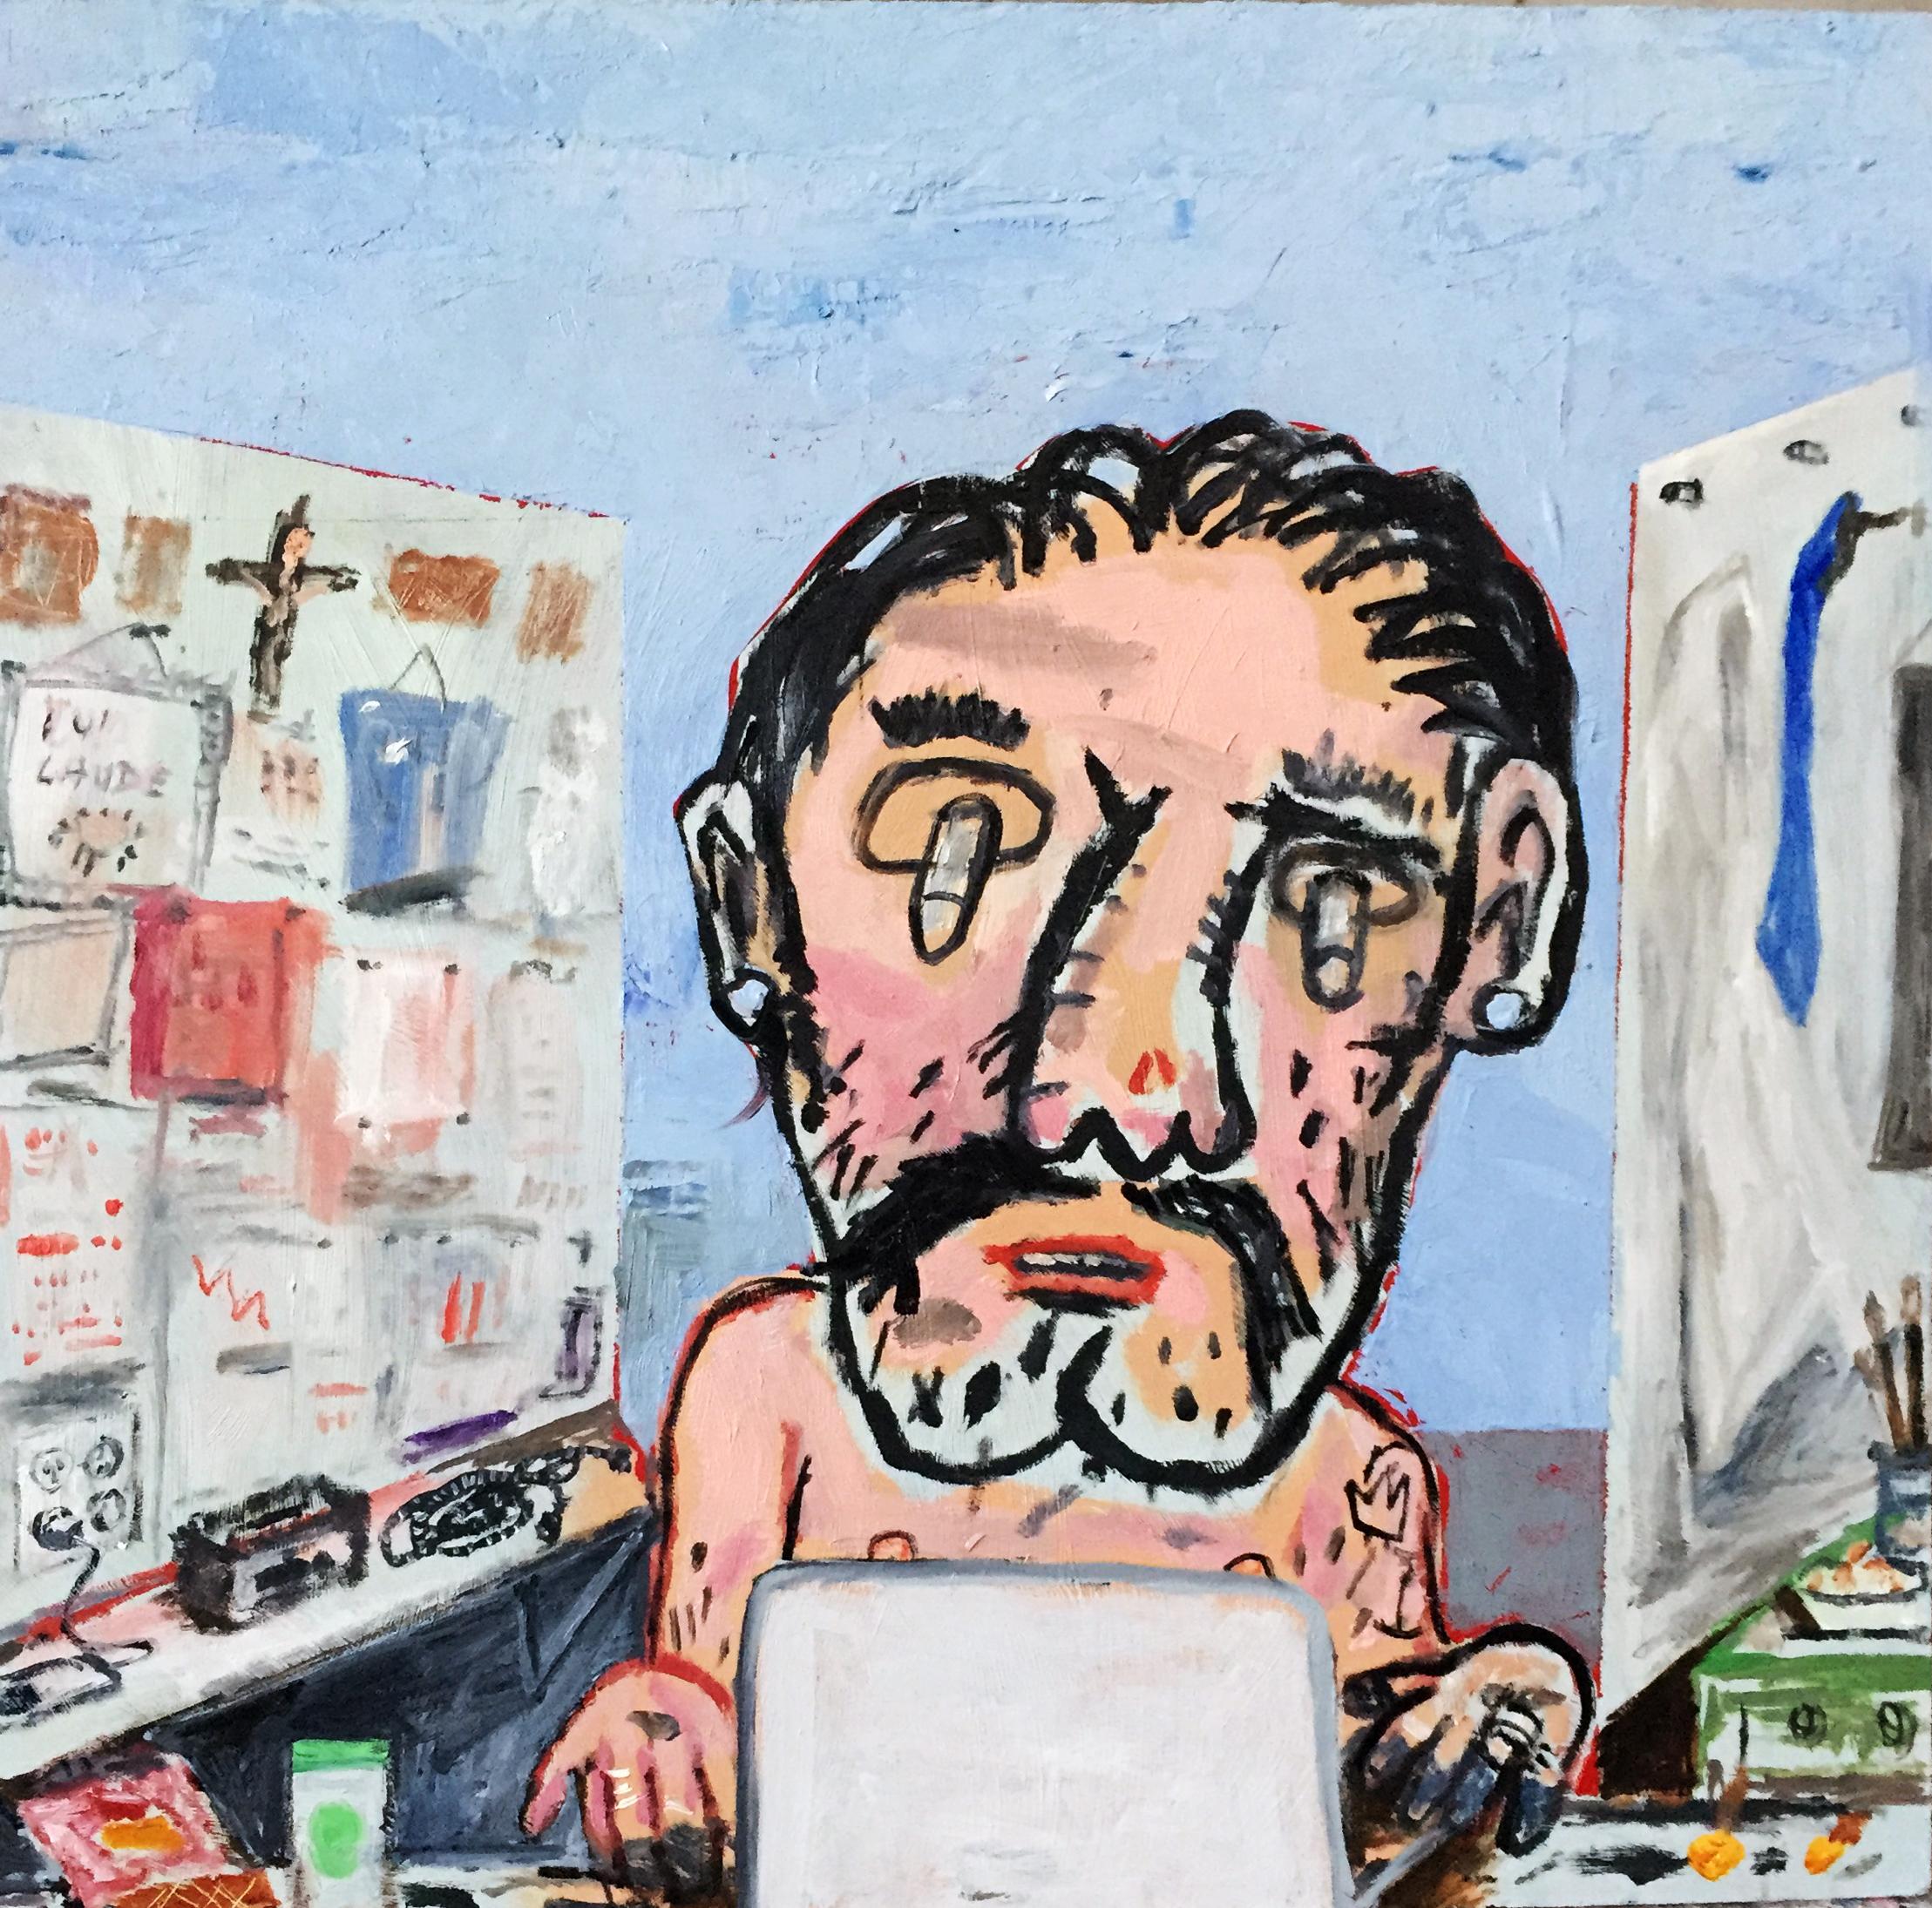 Atelier, Oil on Panel, 12in x 12in, 2016